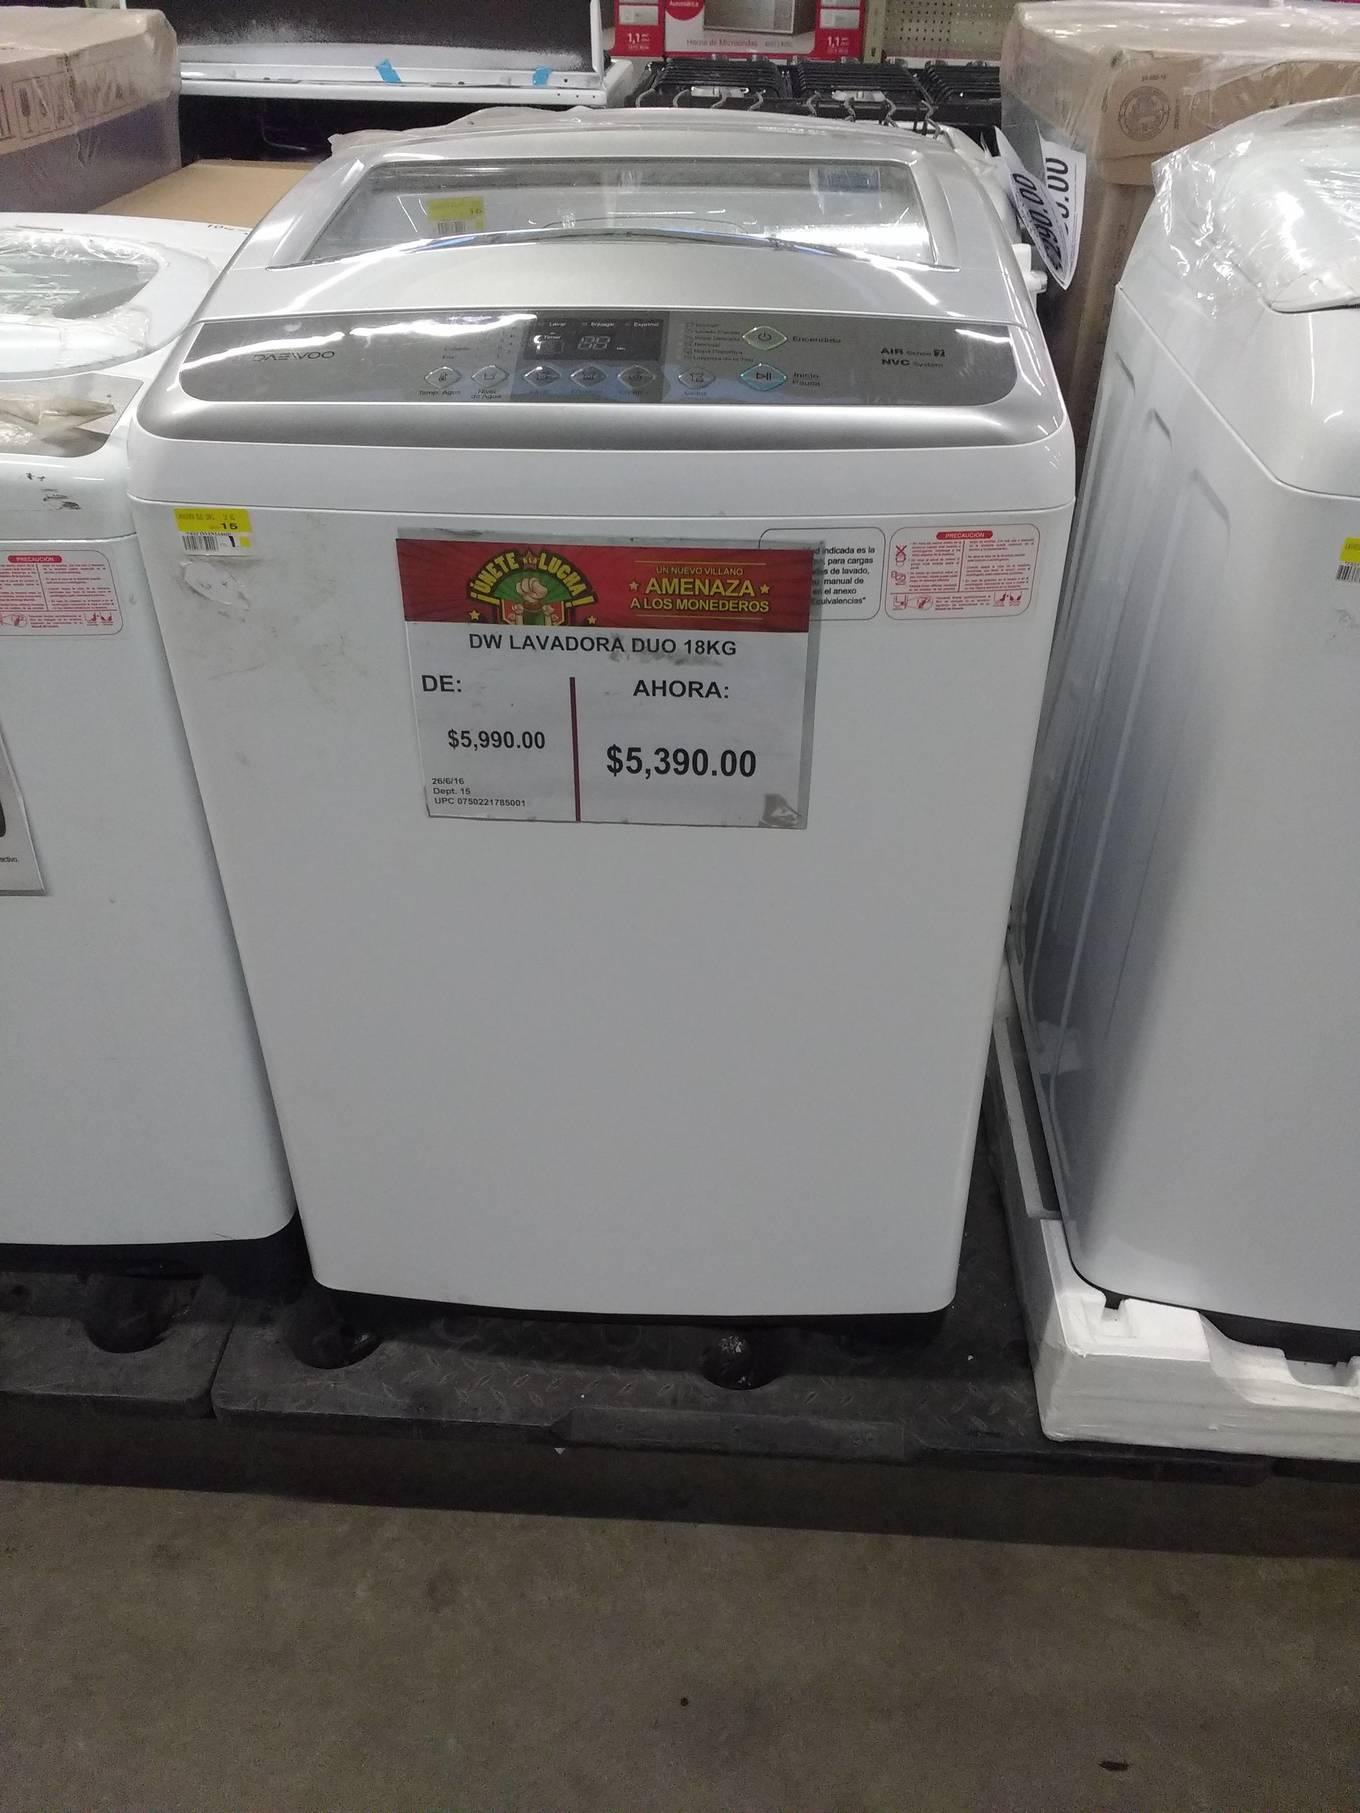 Bodega Aurrerá: lavadora DW de 18kg a $5,390